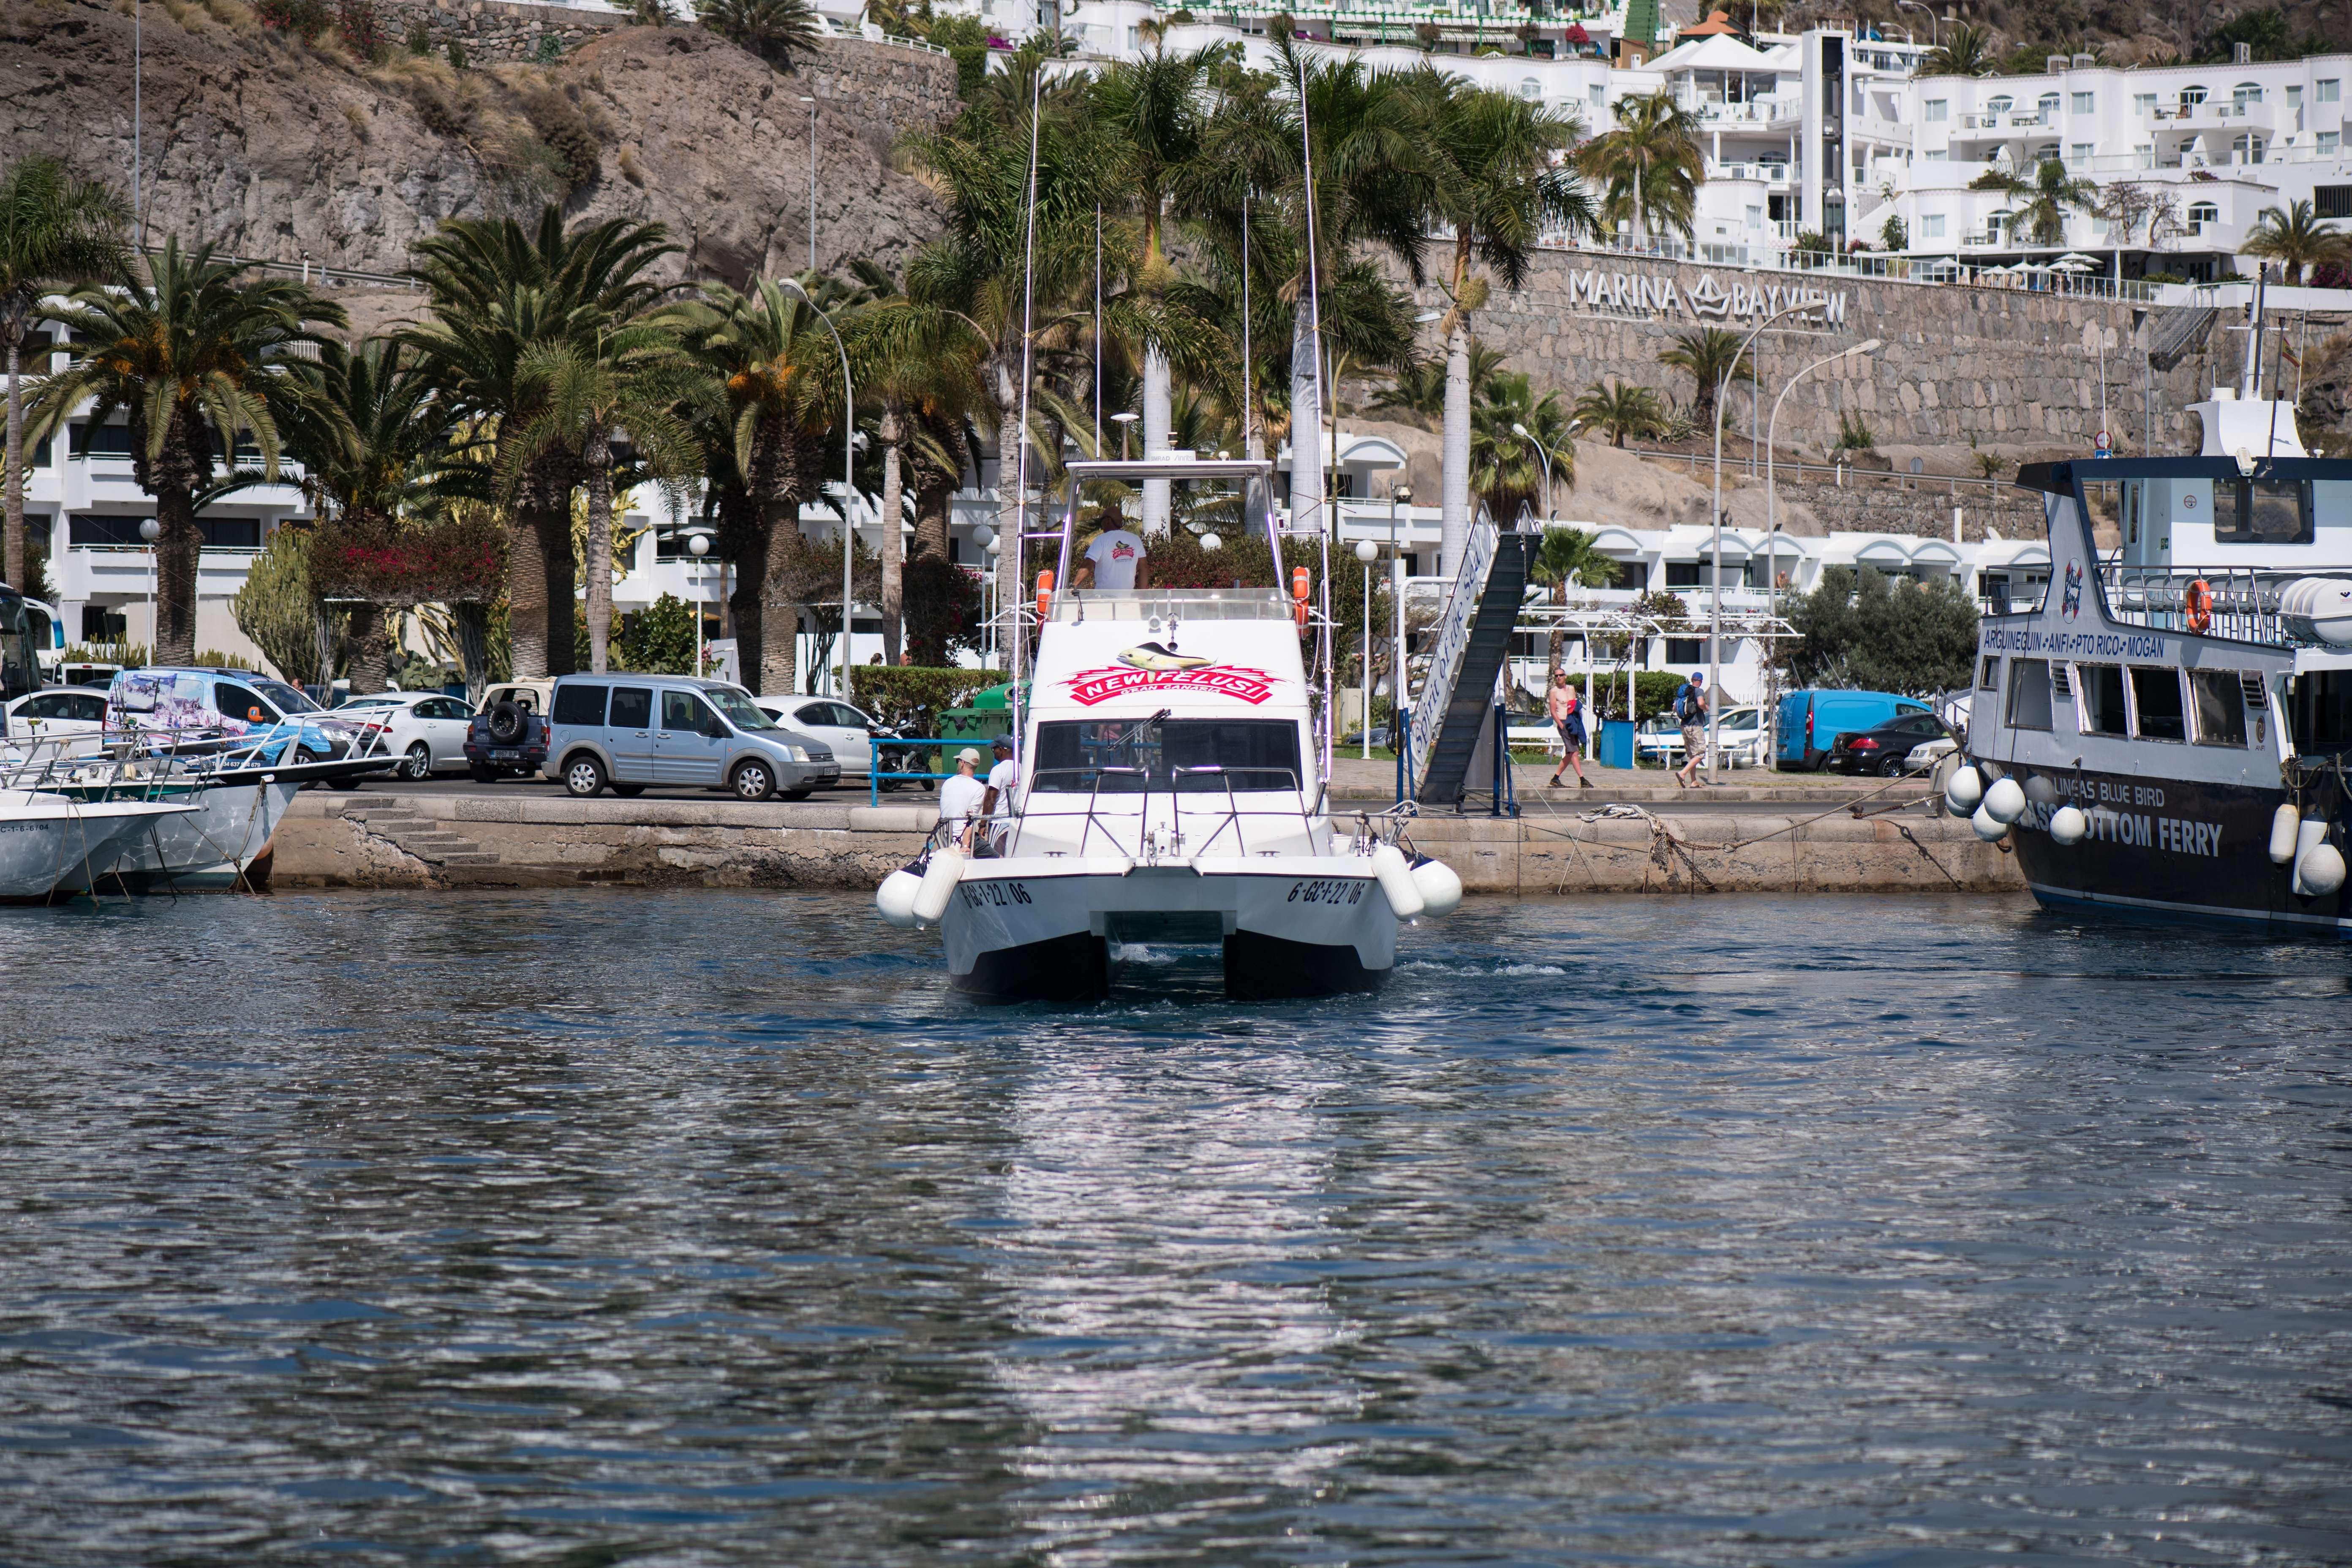 Alquiler de barco de pesca en Gran Canaria